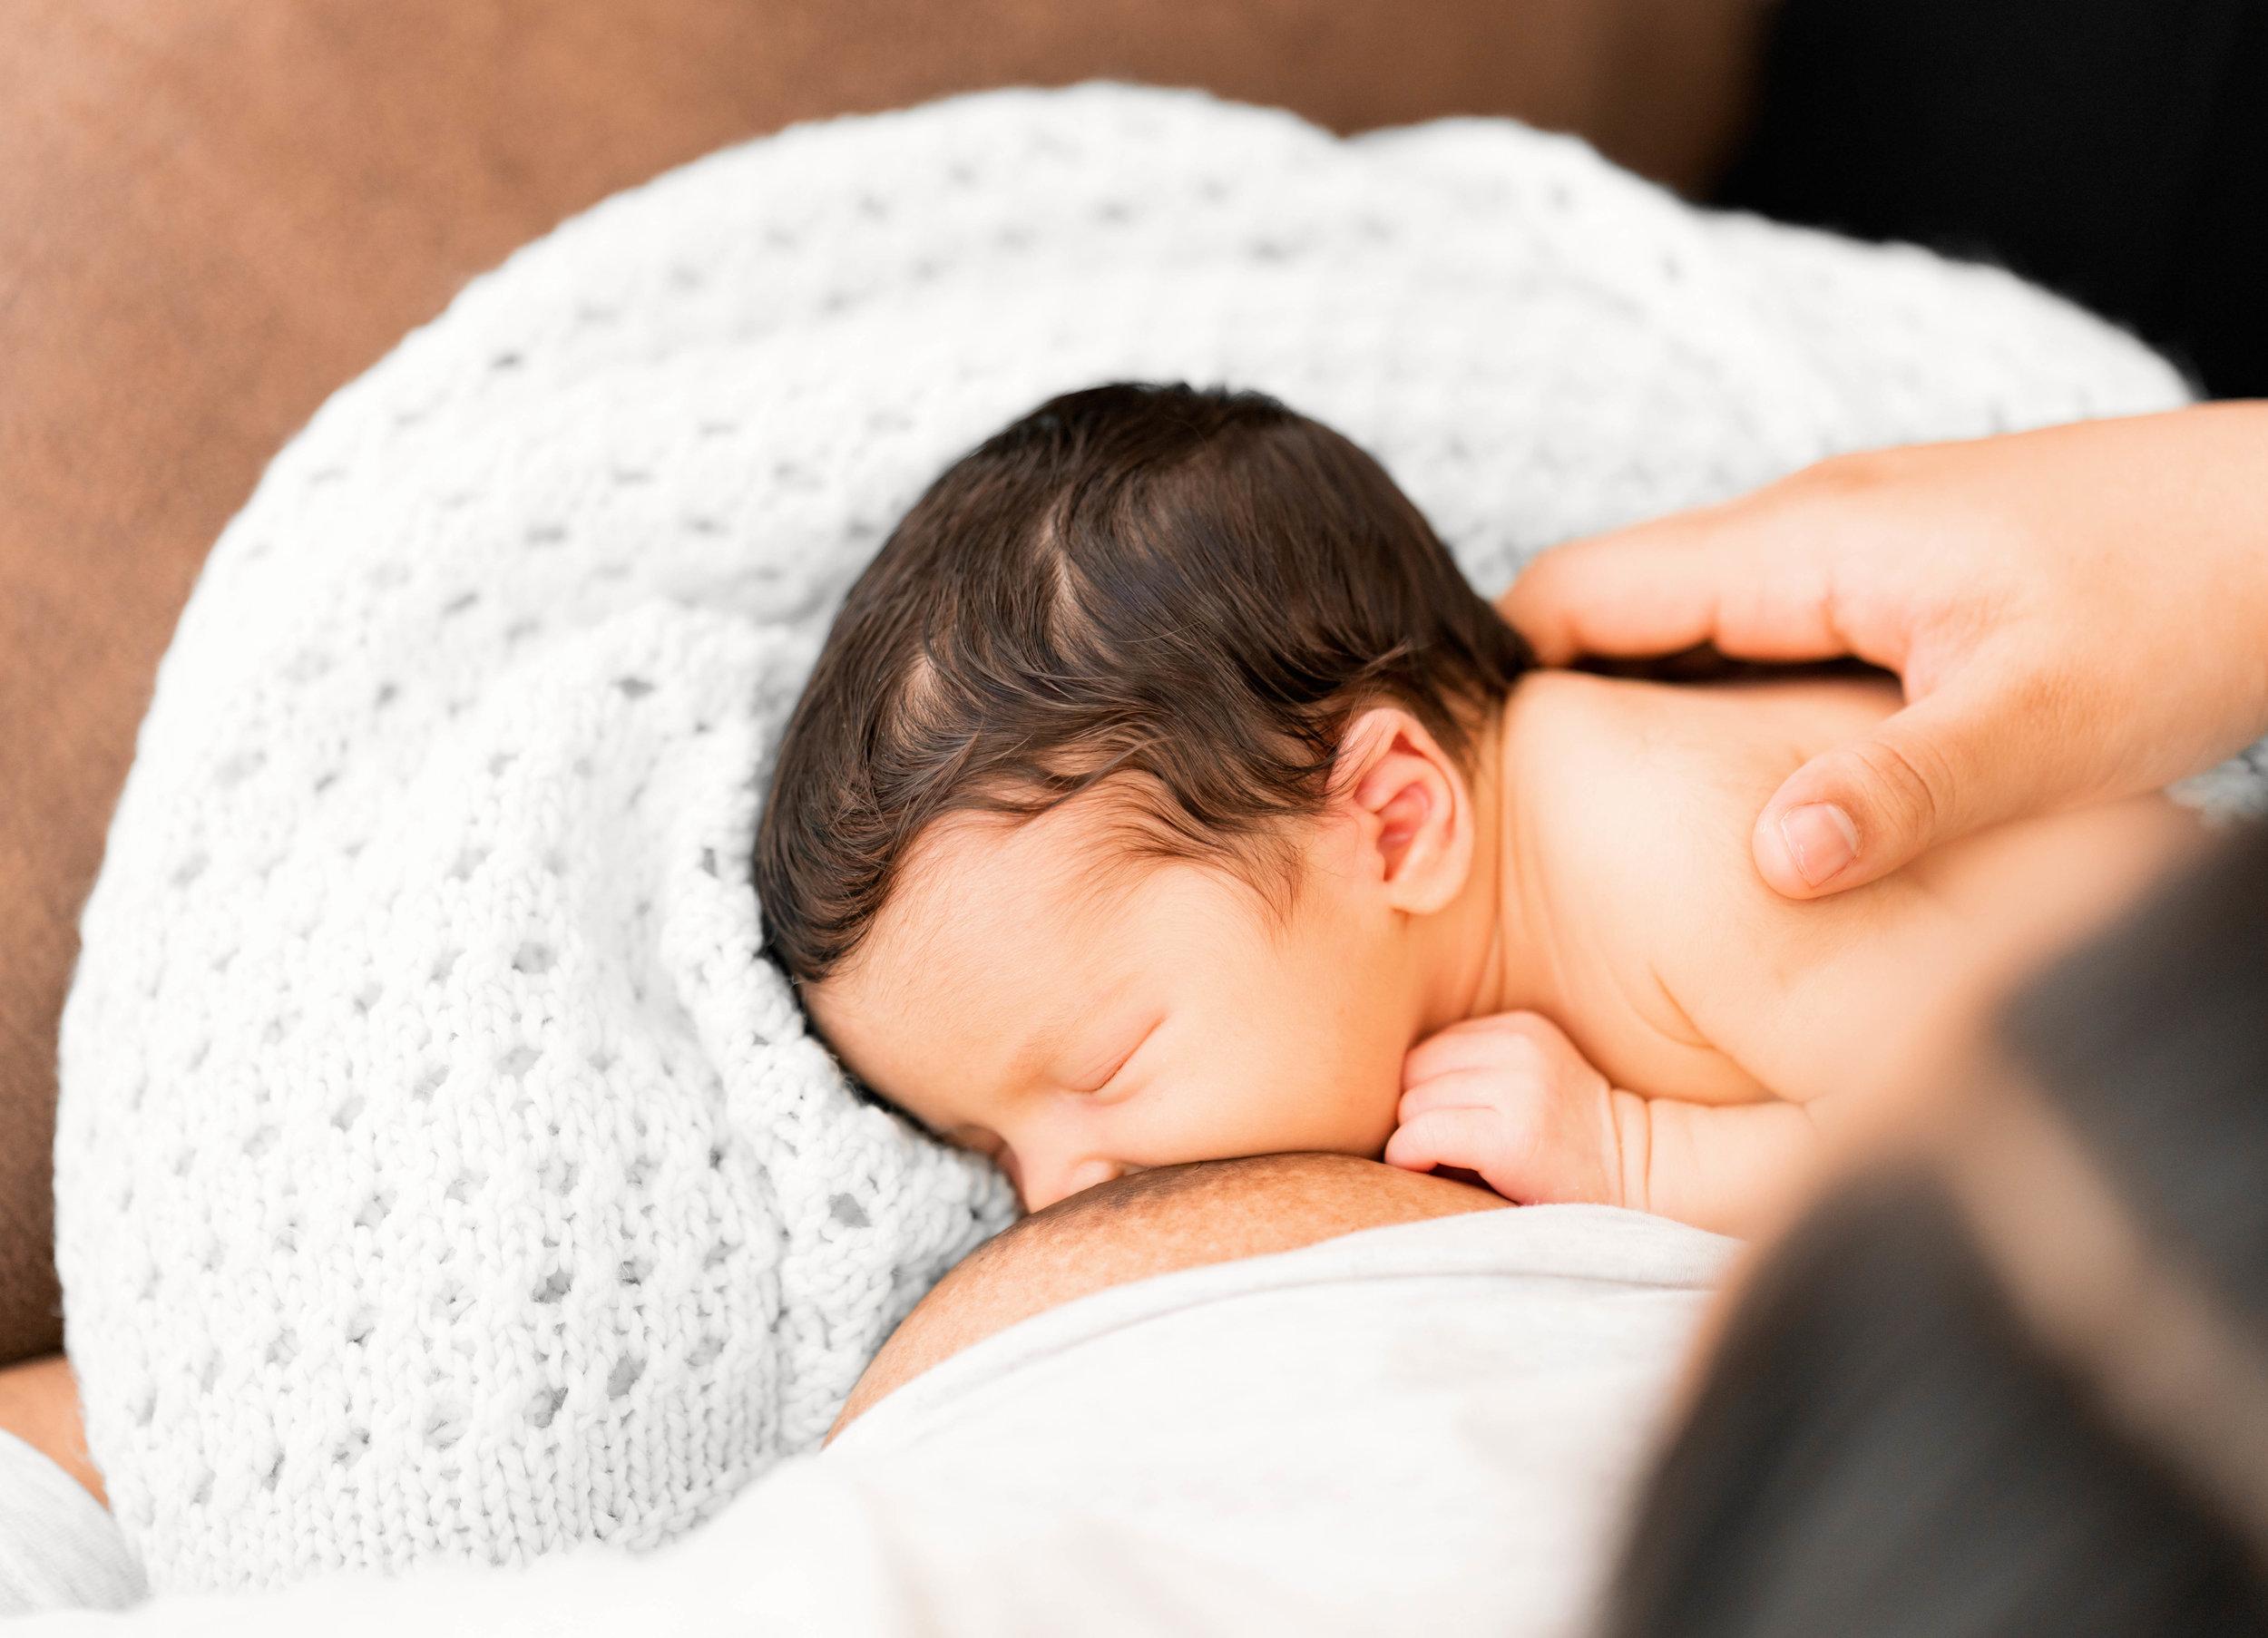 Intimate lifestyle in-home newborn session in Landstuhl, kmc area Germany by family photographer Sarah Havens. Breasfeeding Session. Kuscheliges home session mit Neugeborenem Mädchen und Eltern in Ramstein , Rheinland-Pfalz.